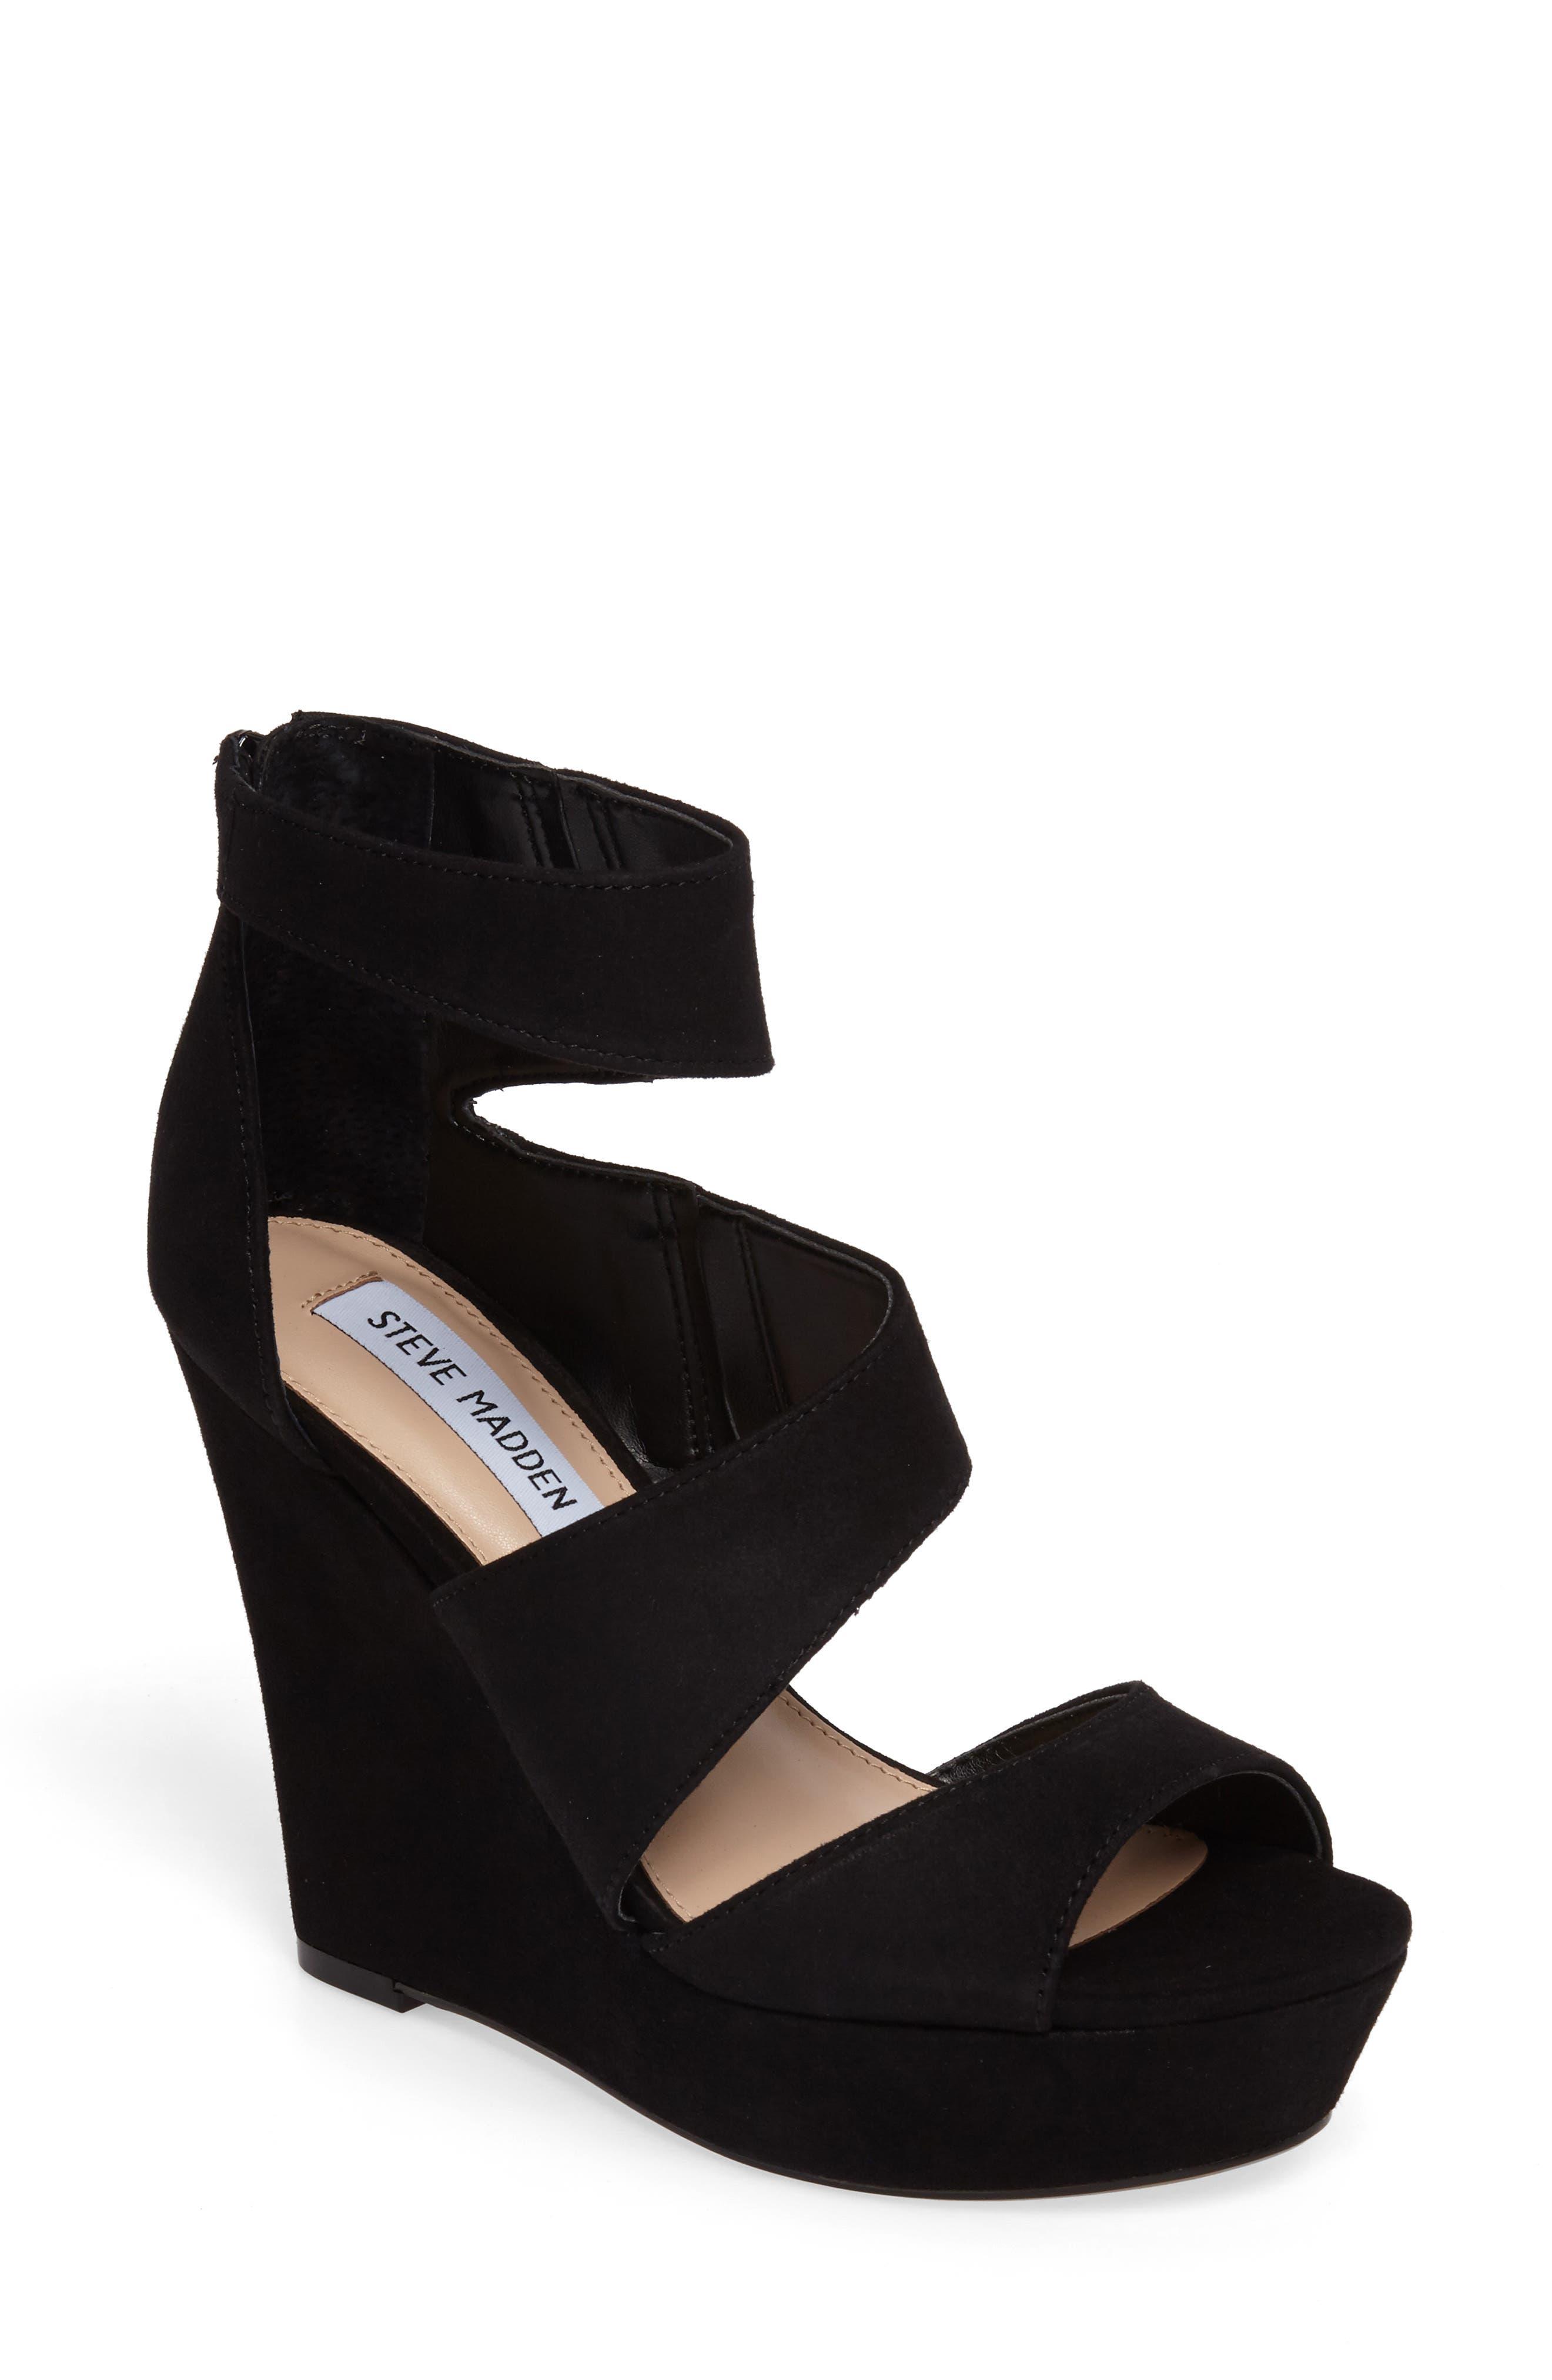 Essey Asymmetrical Platform Wedge Sandal,                         Main,                         color, 006